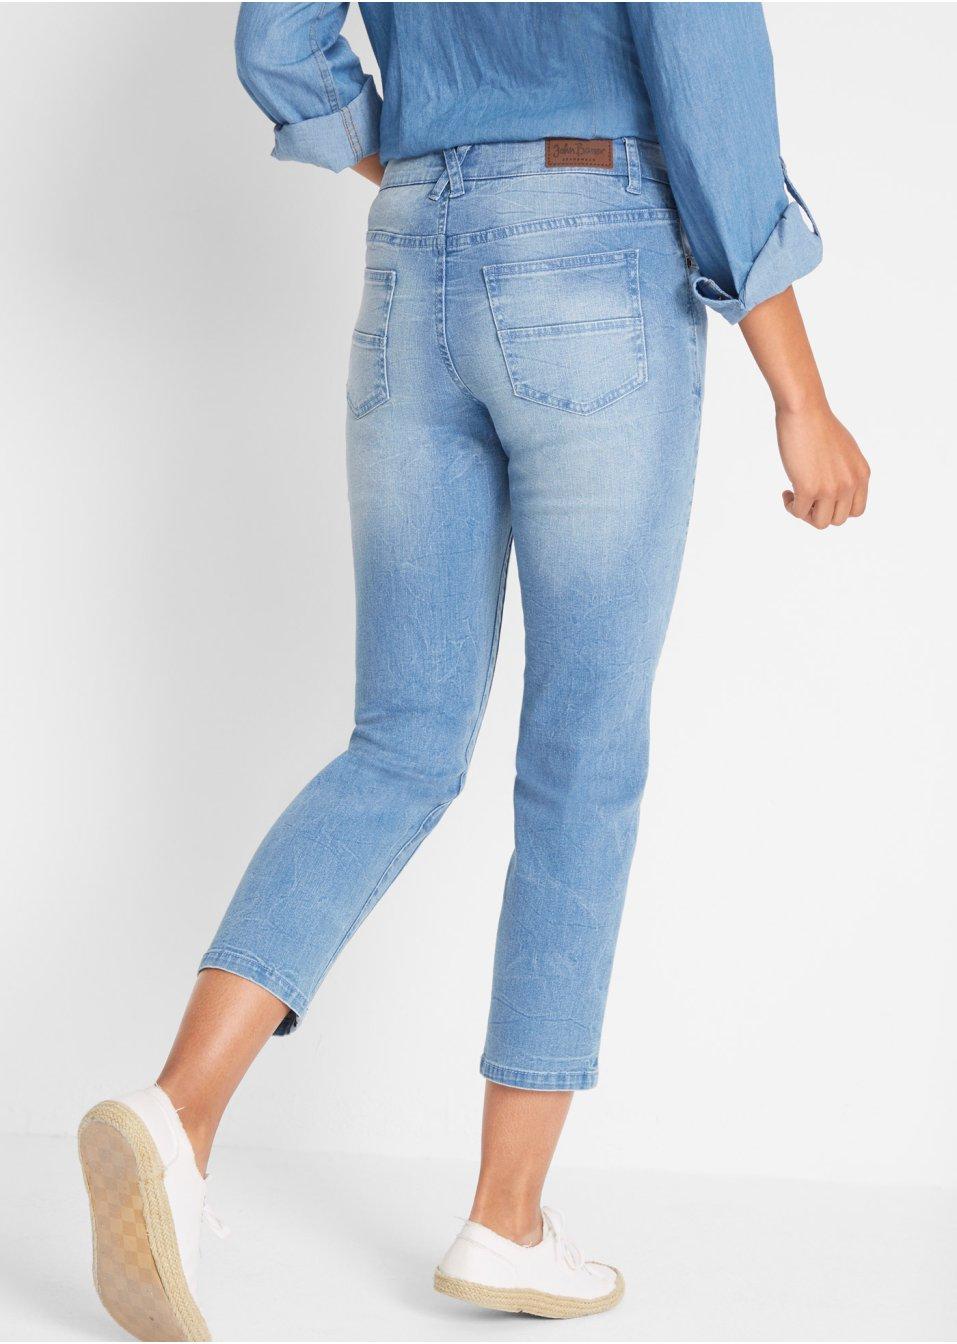 Mode Femme Vêtements DJLfdOFlkj Beau jean soft 7/8, délavage mode bleu bleached, T.N.